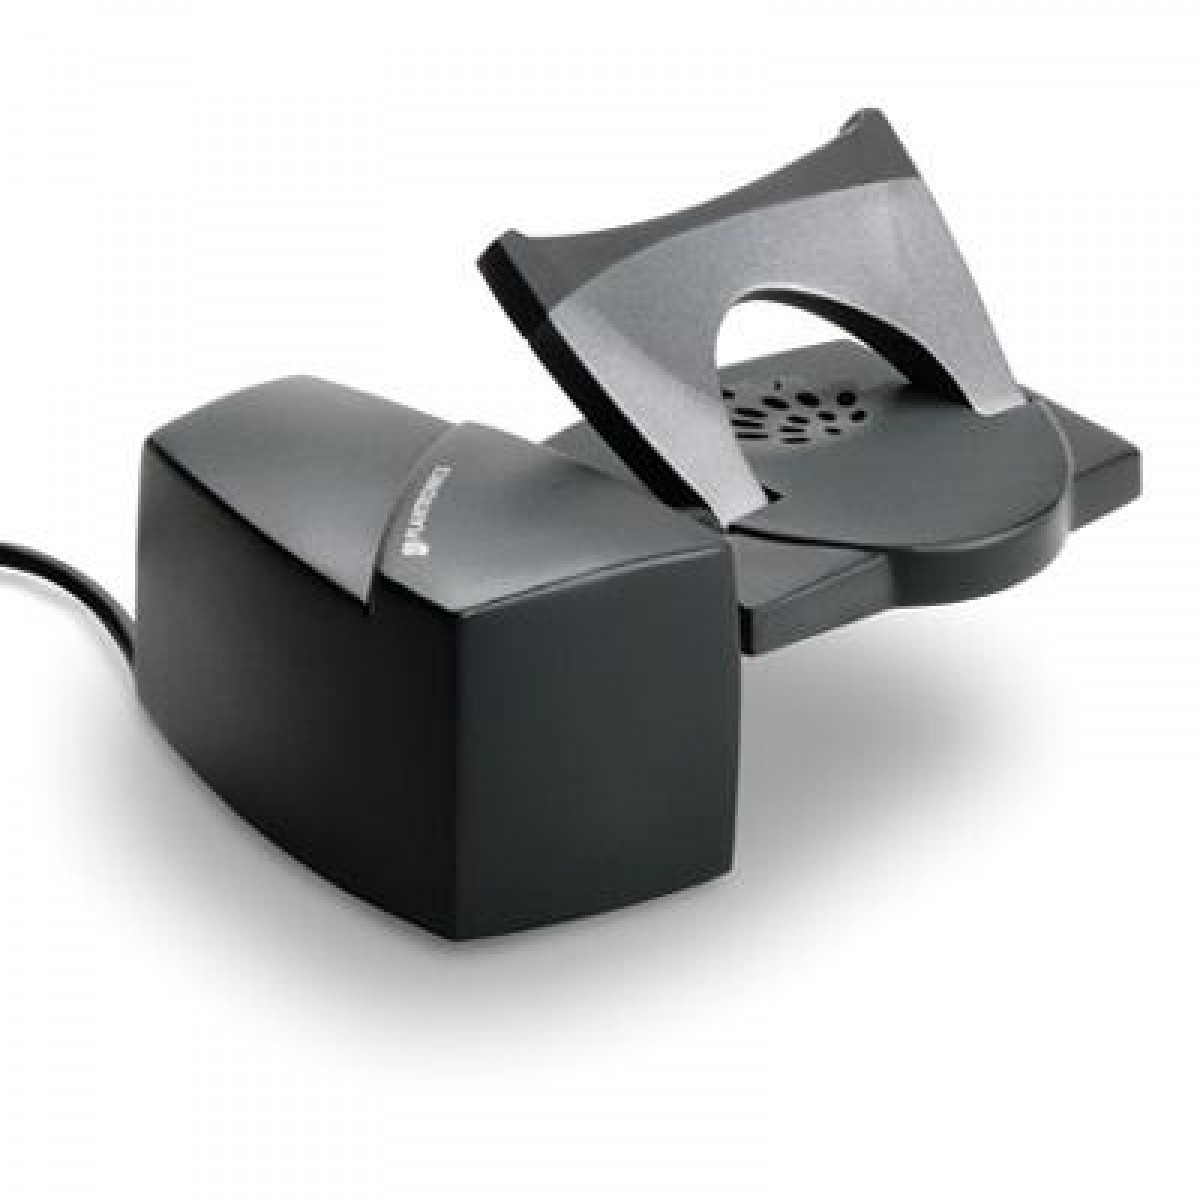 plantronics hl10 lifter for CS300 wireless